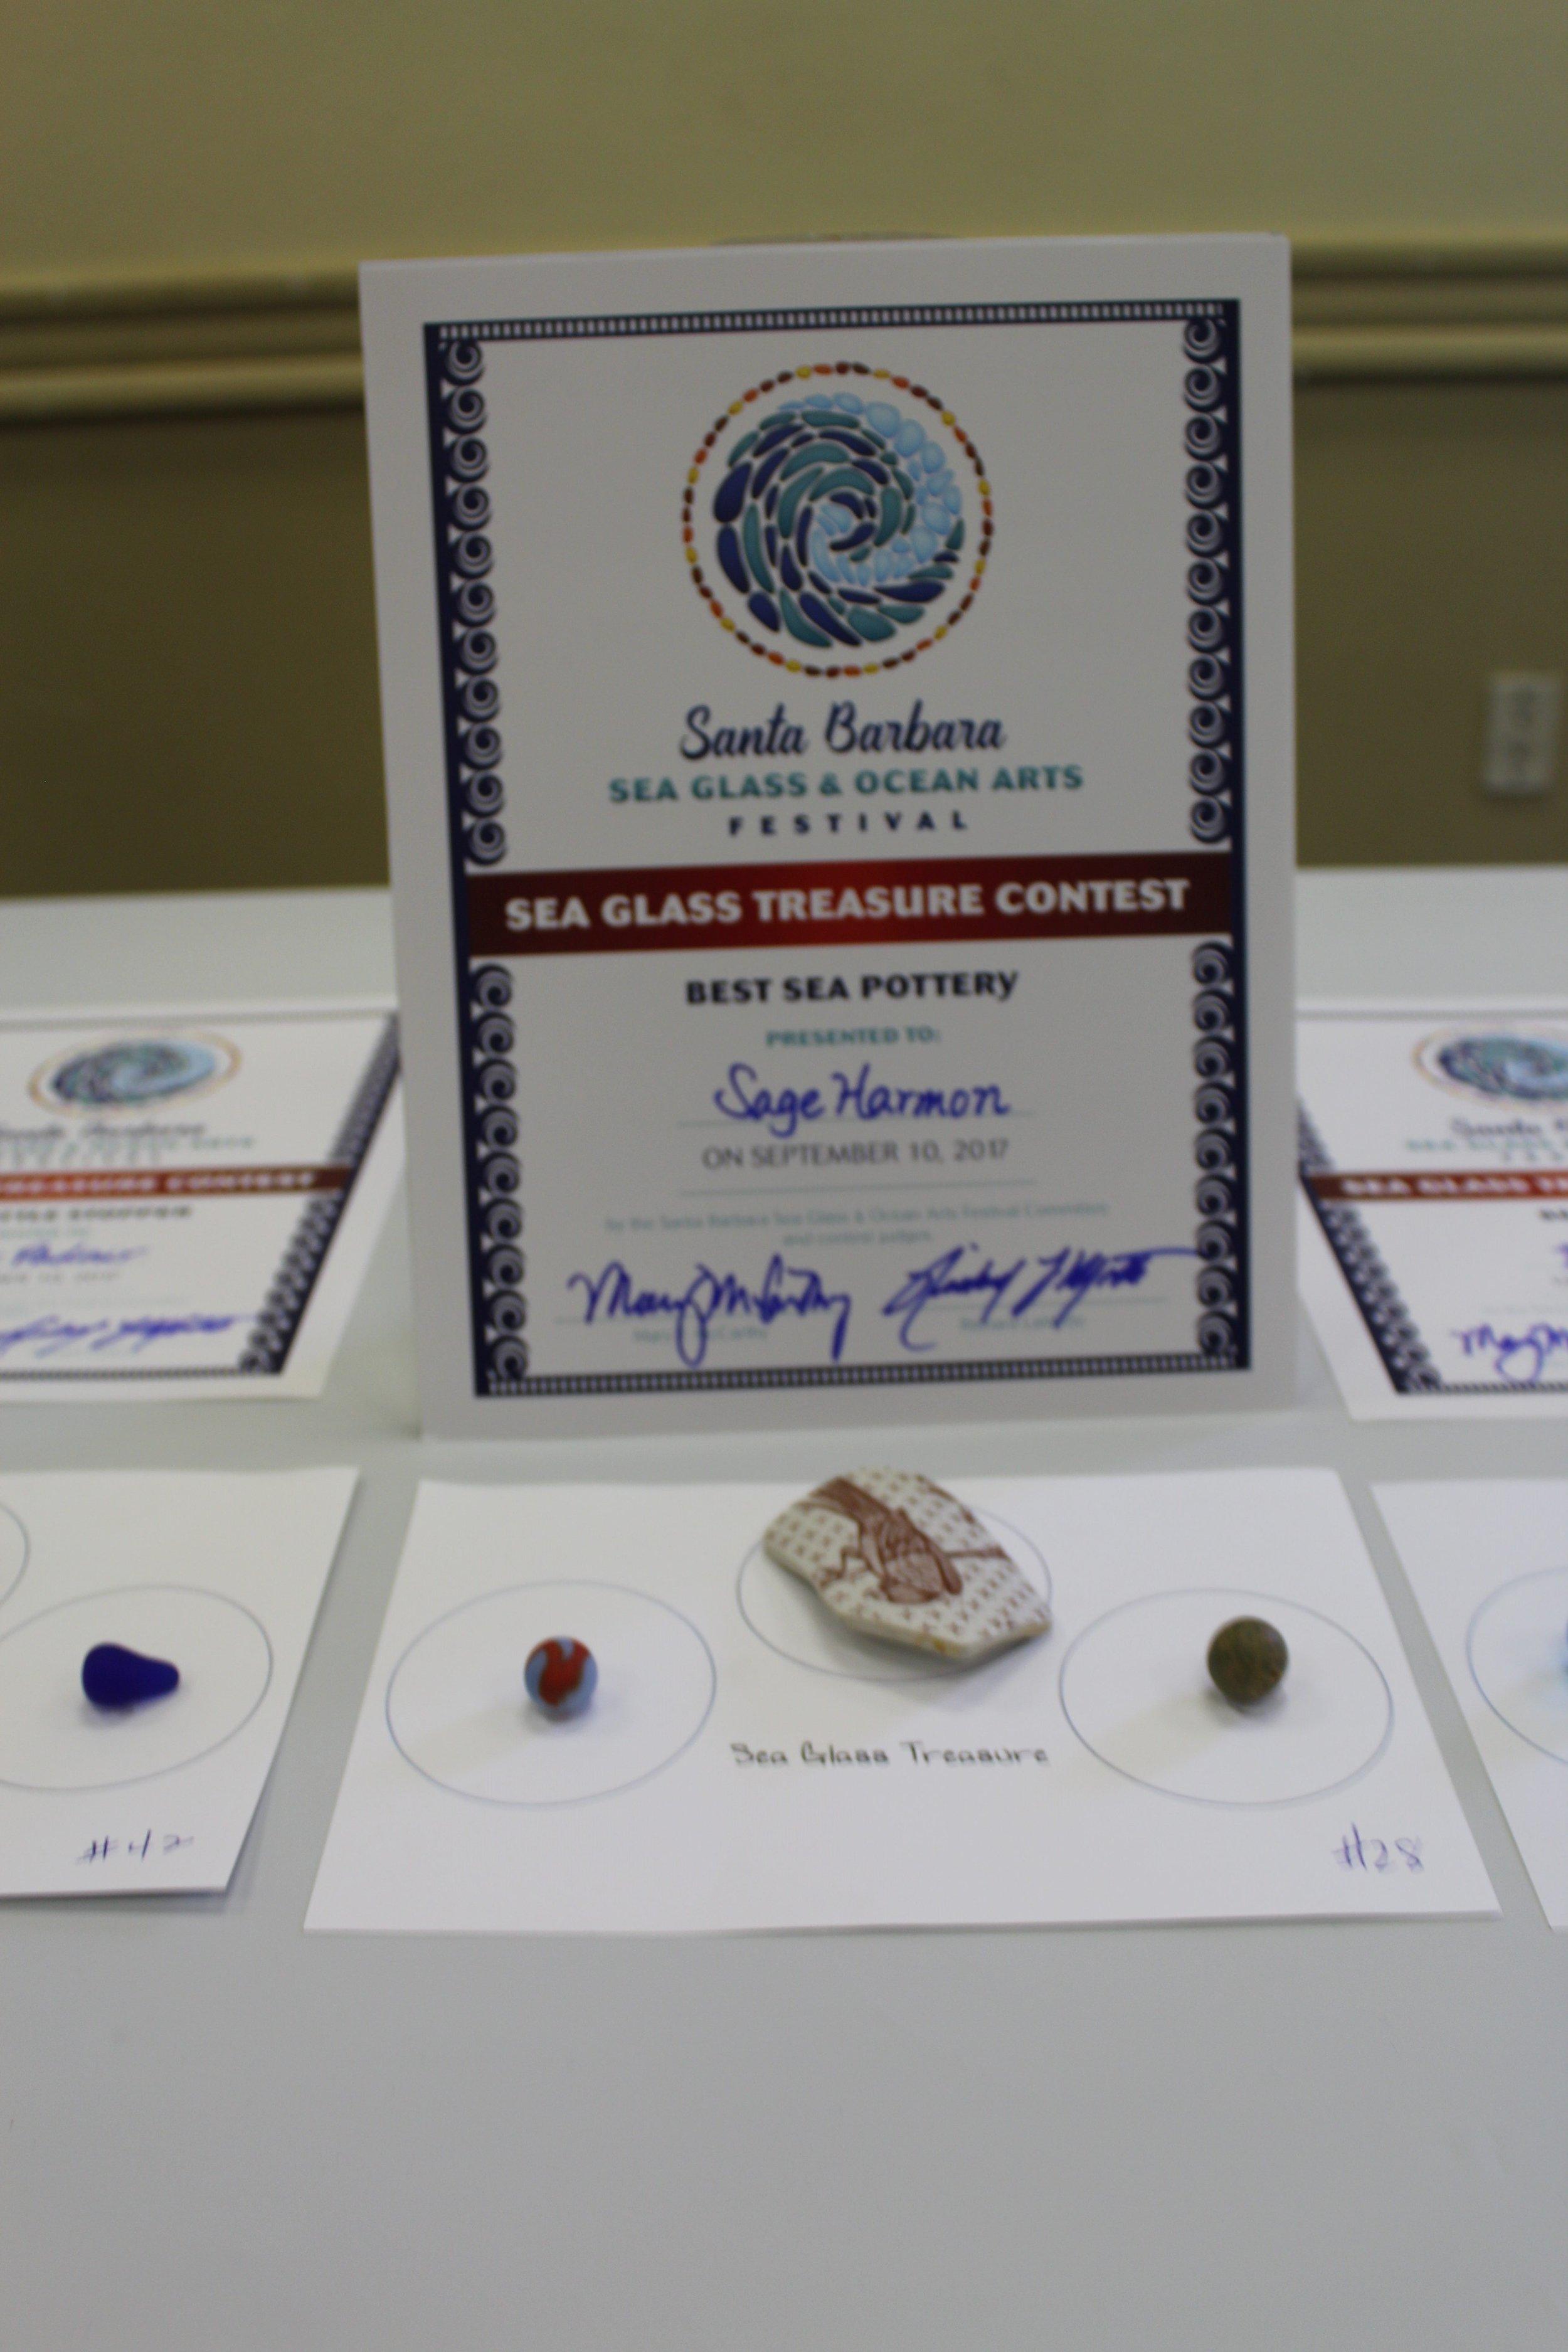 Best Sea Pottery: Sage Harmon